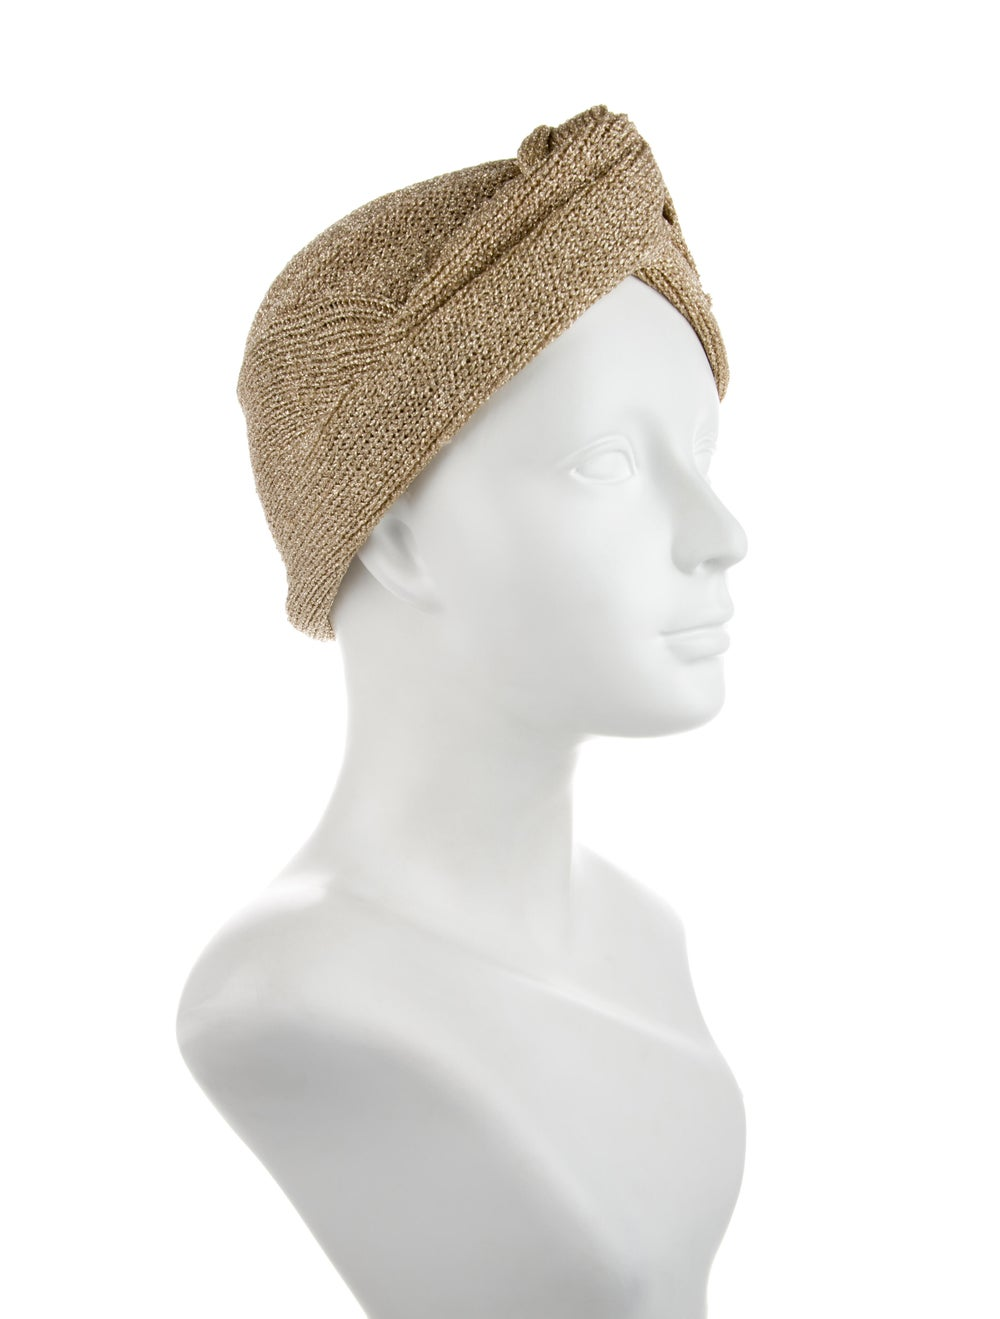 Patricia Underwood Metallic Knot headband Gold - image 3